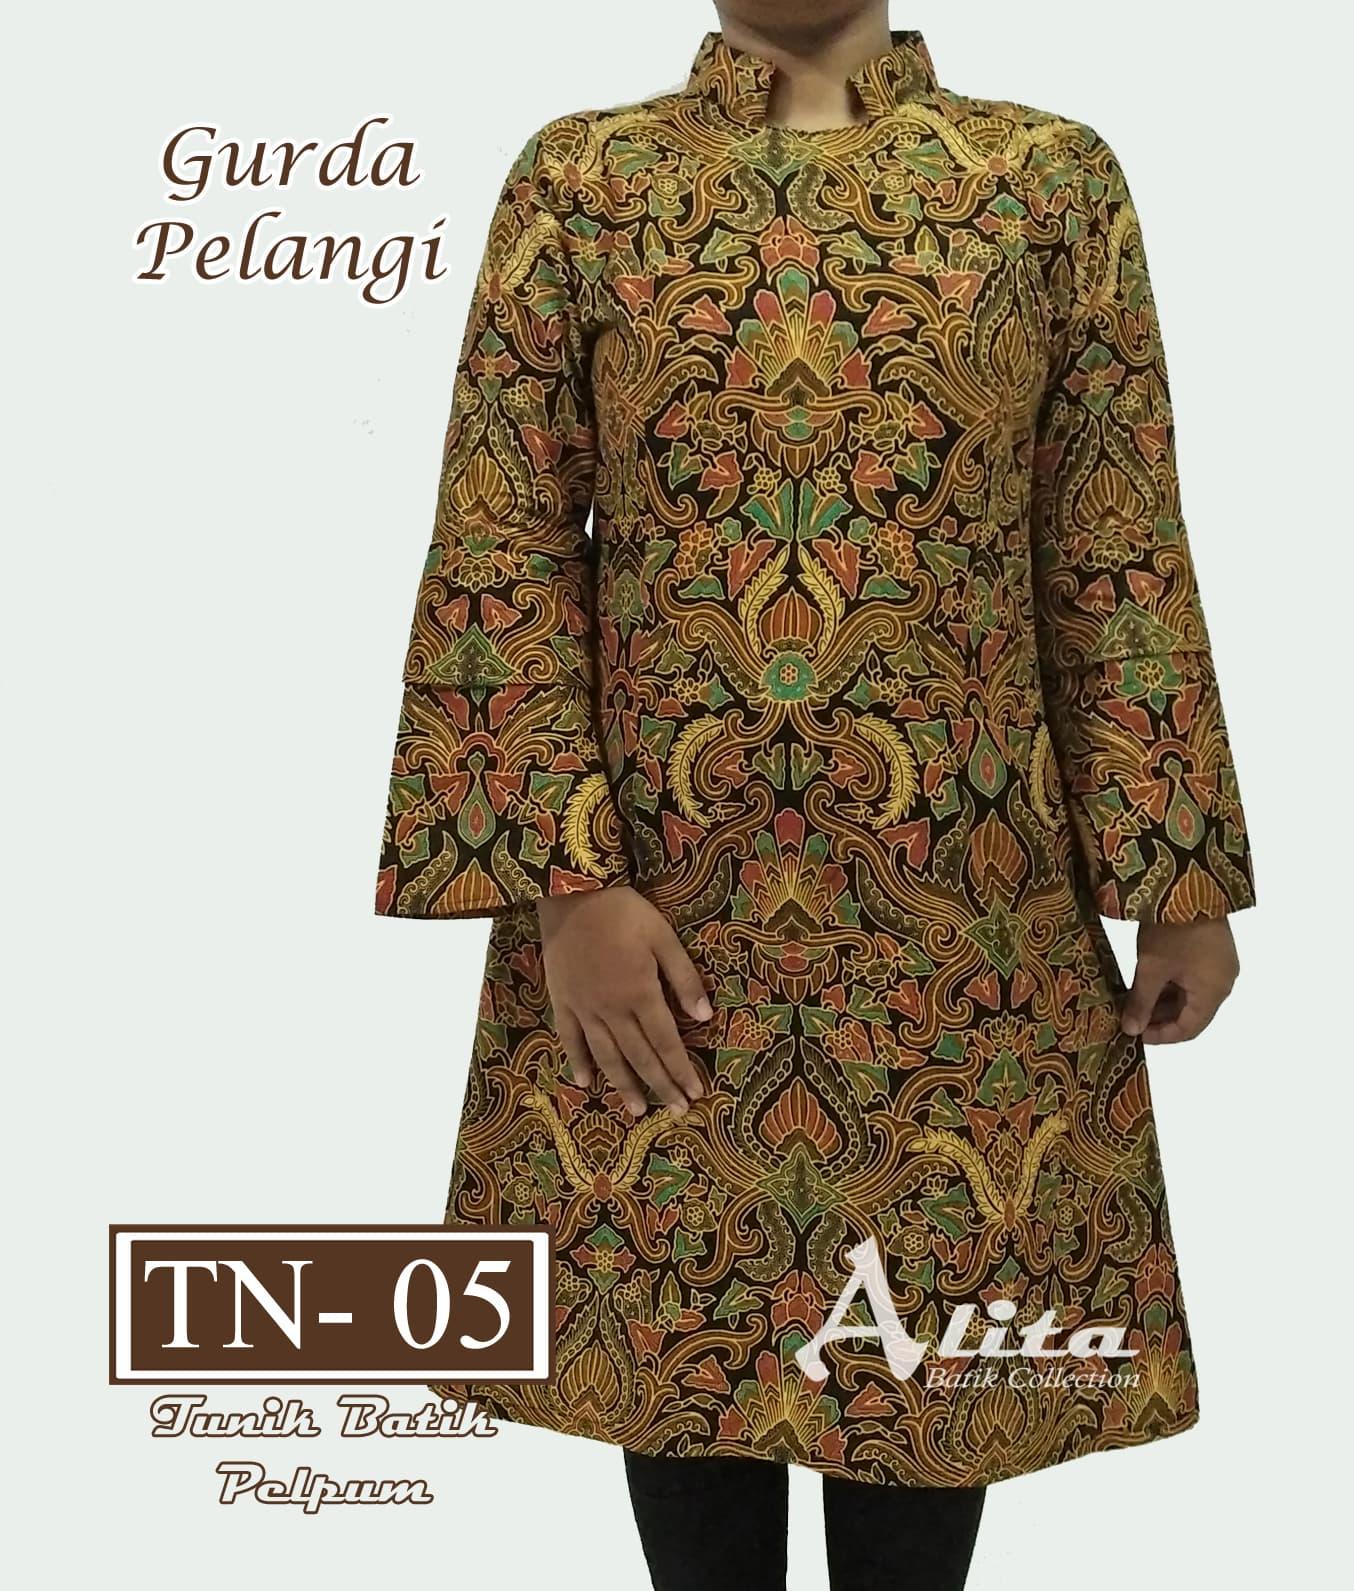 Atasan Batik Wanita Promo - Produk Terlaris ff406b81c0